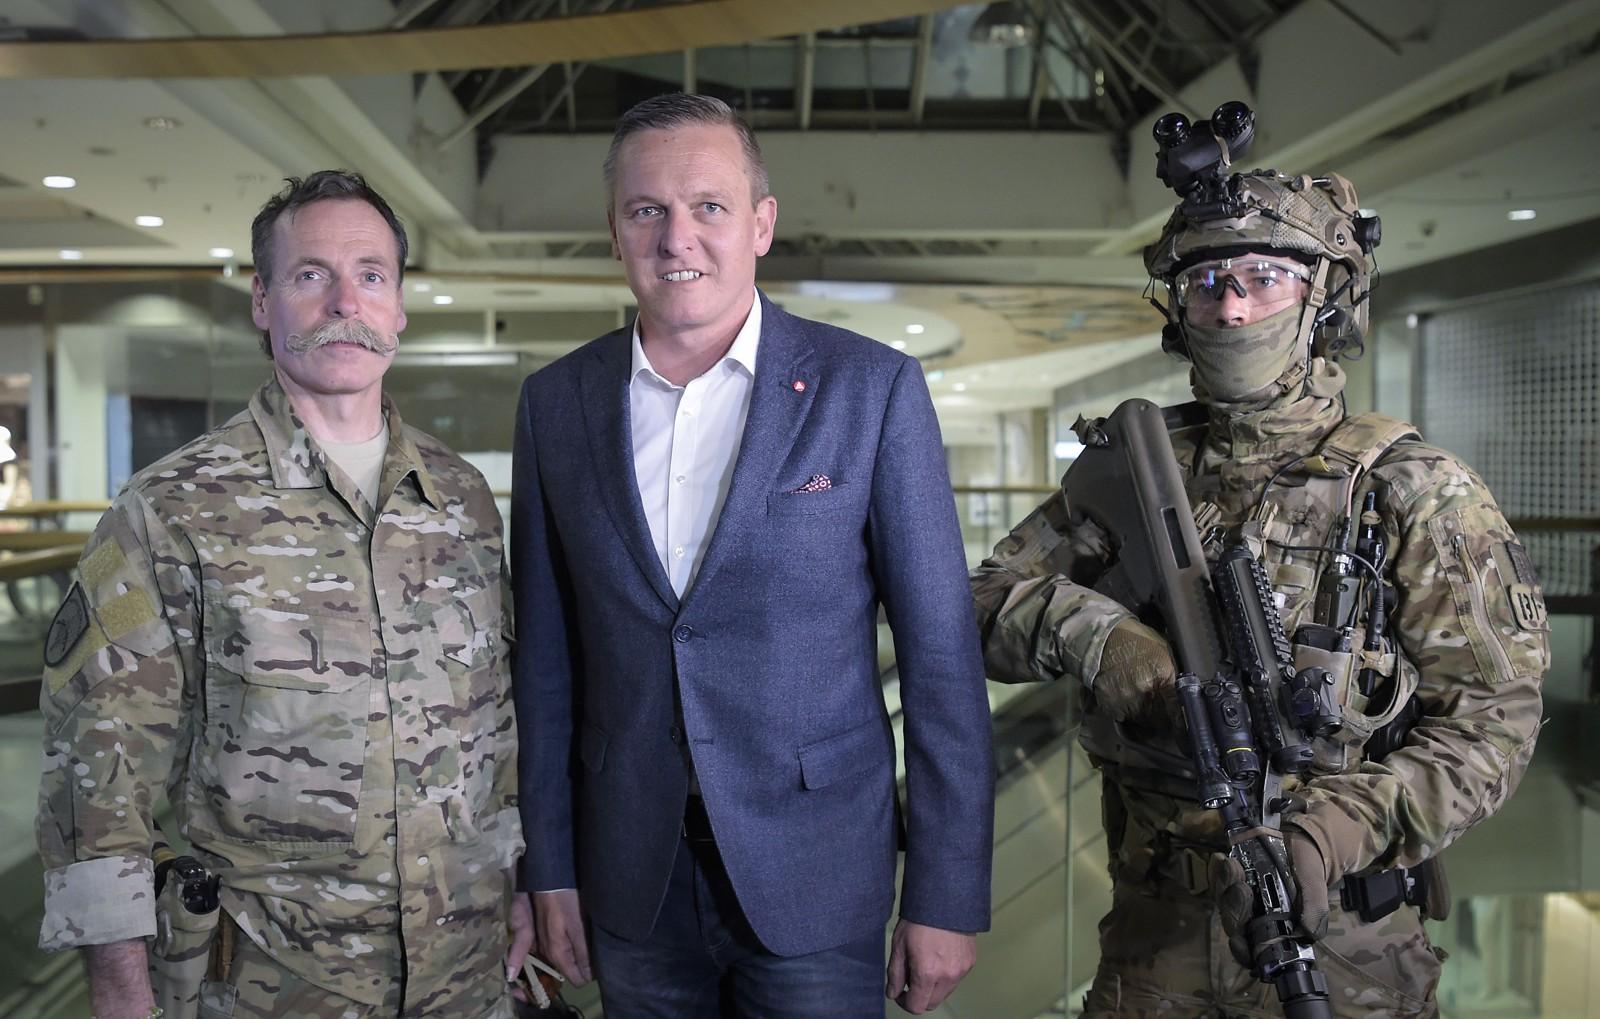 Oberst Hofer, der Kommandant des Jagdkommandos, Verteidigungsminister Kunasek und ein Jagdkommando-Soldat © Bundesheer